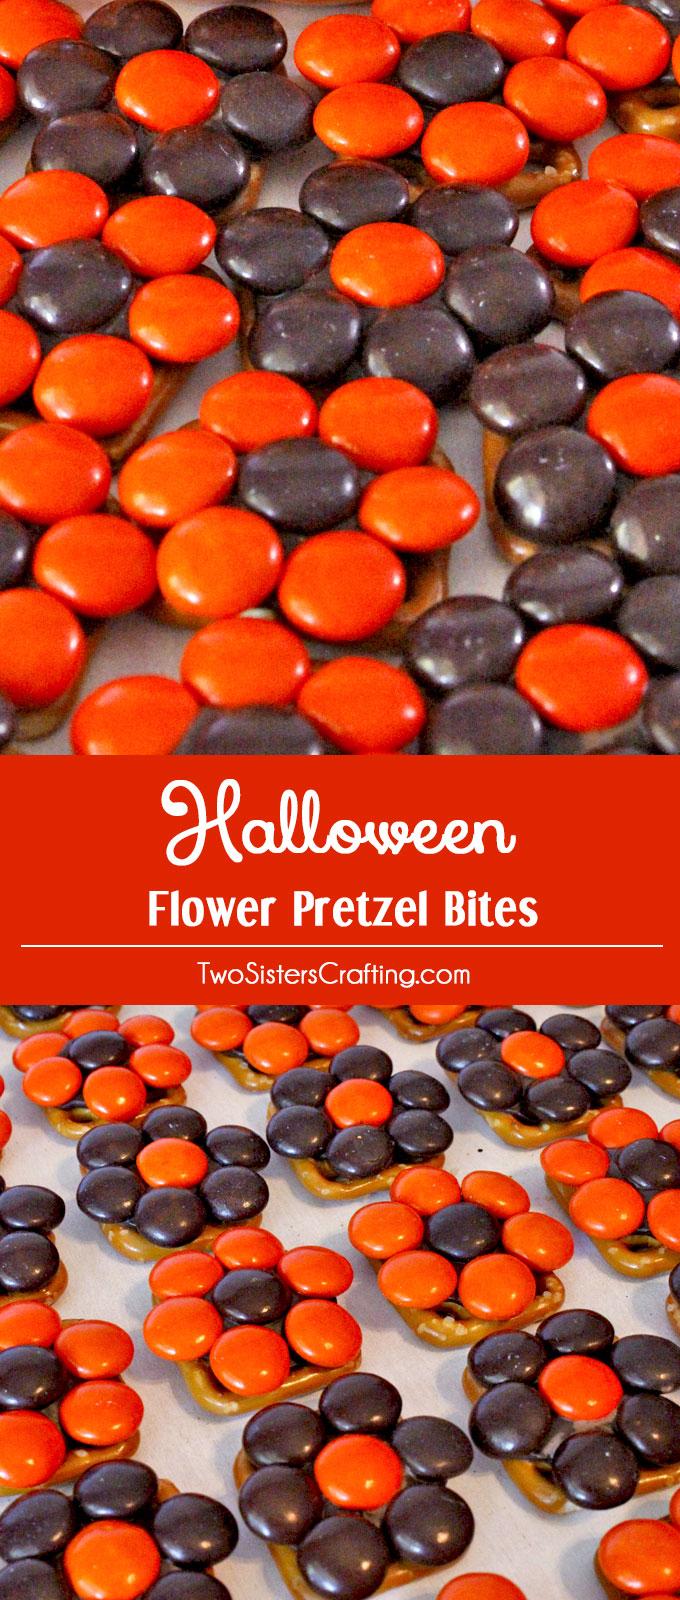 Halloween Flower Pretzel Bites Two Sisters